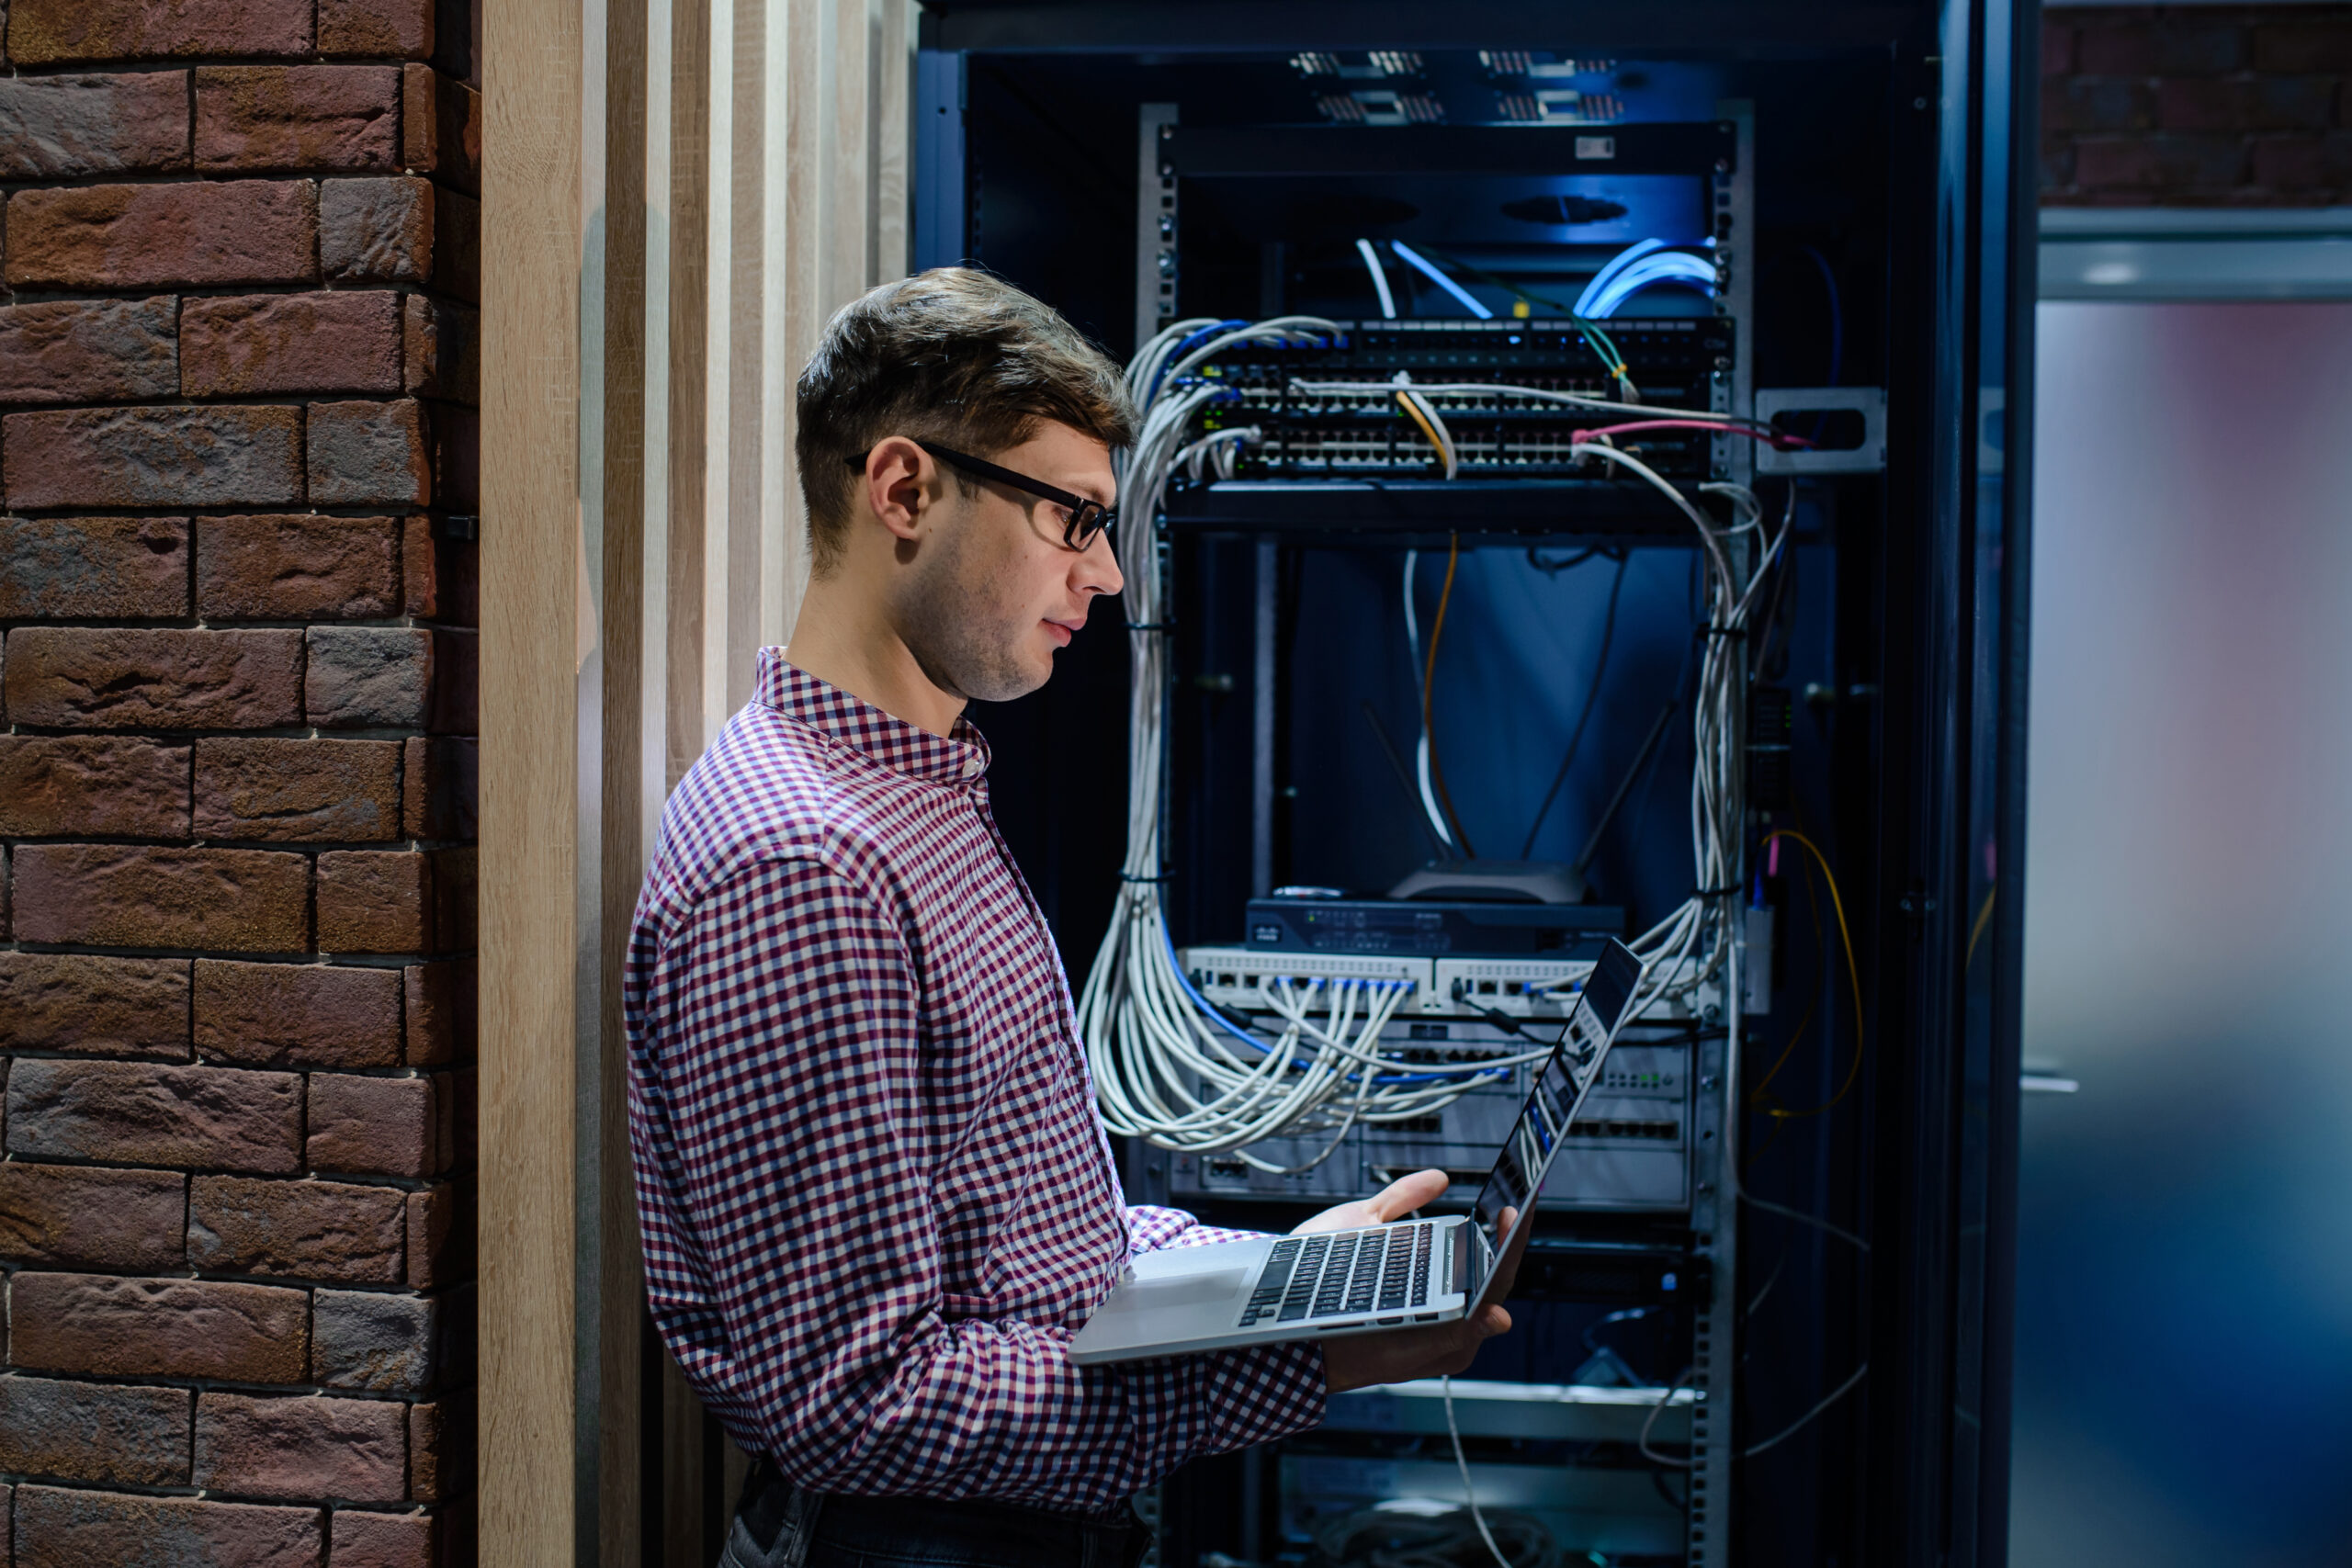 Image of IT Technician